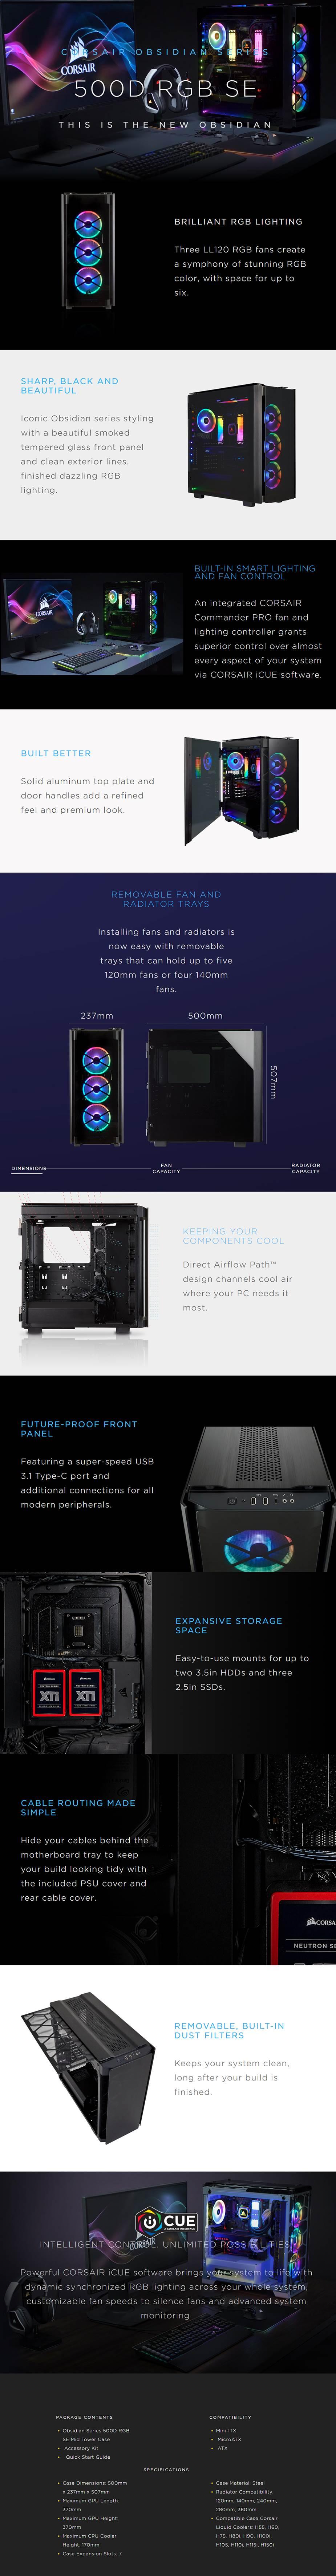 Corsair Obsidian 500D RGB SE Tempered Glass Mid-Tower ATX Case